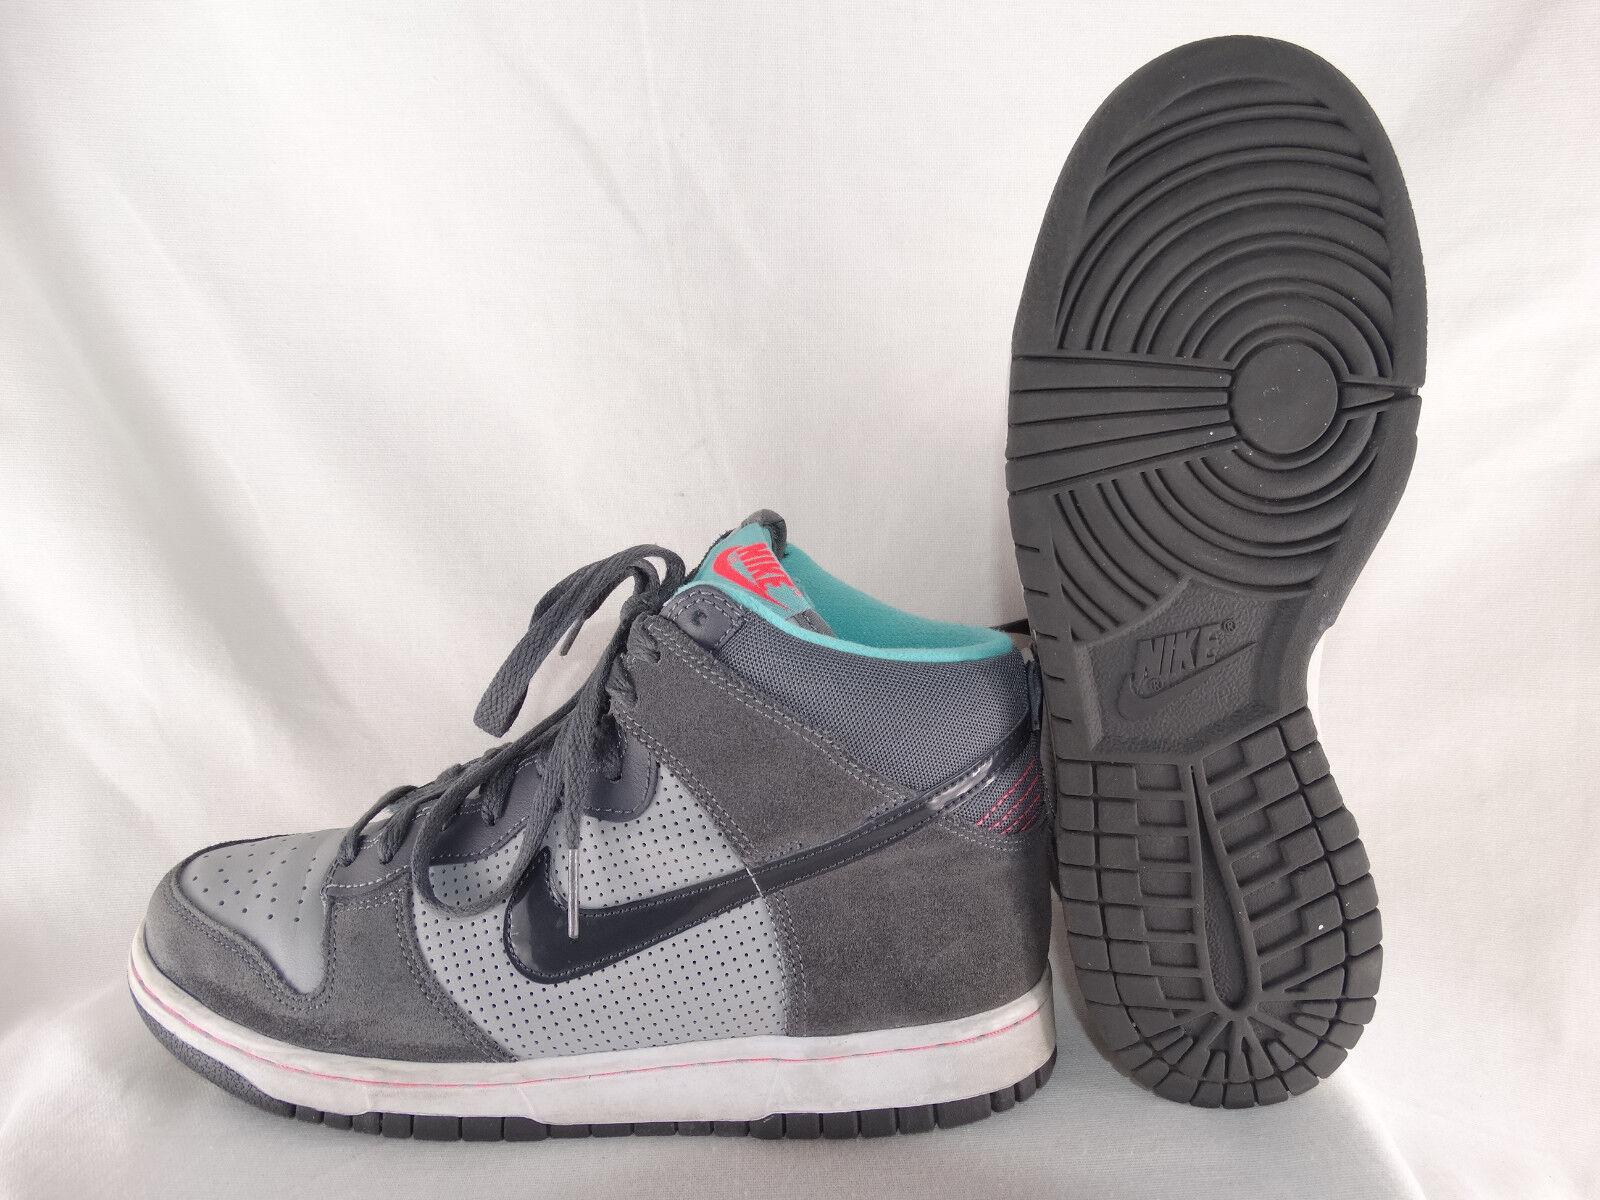 Nike Dunk High (GS) Kids Damen Turnschuhe 308319-025 grau-mint EU 40 US 7Y Leichte Schuhe